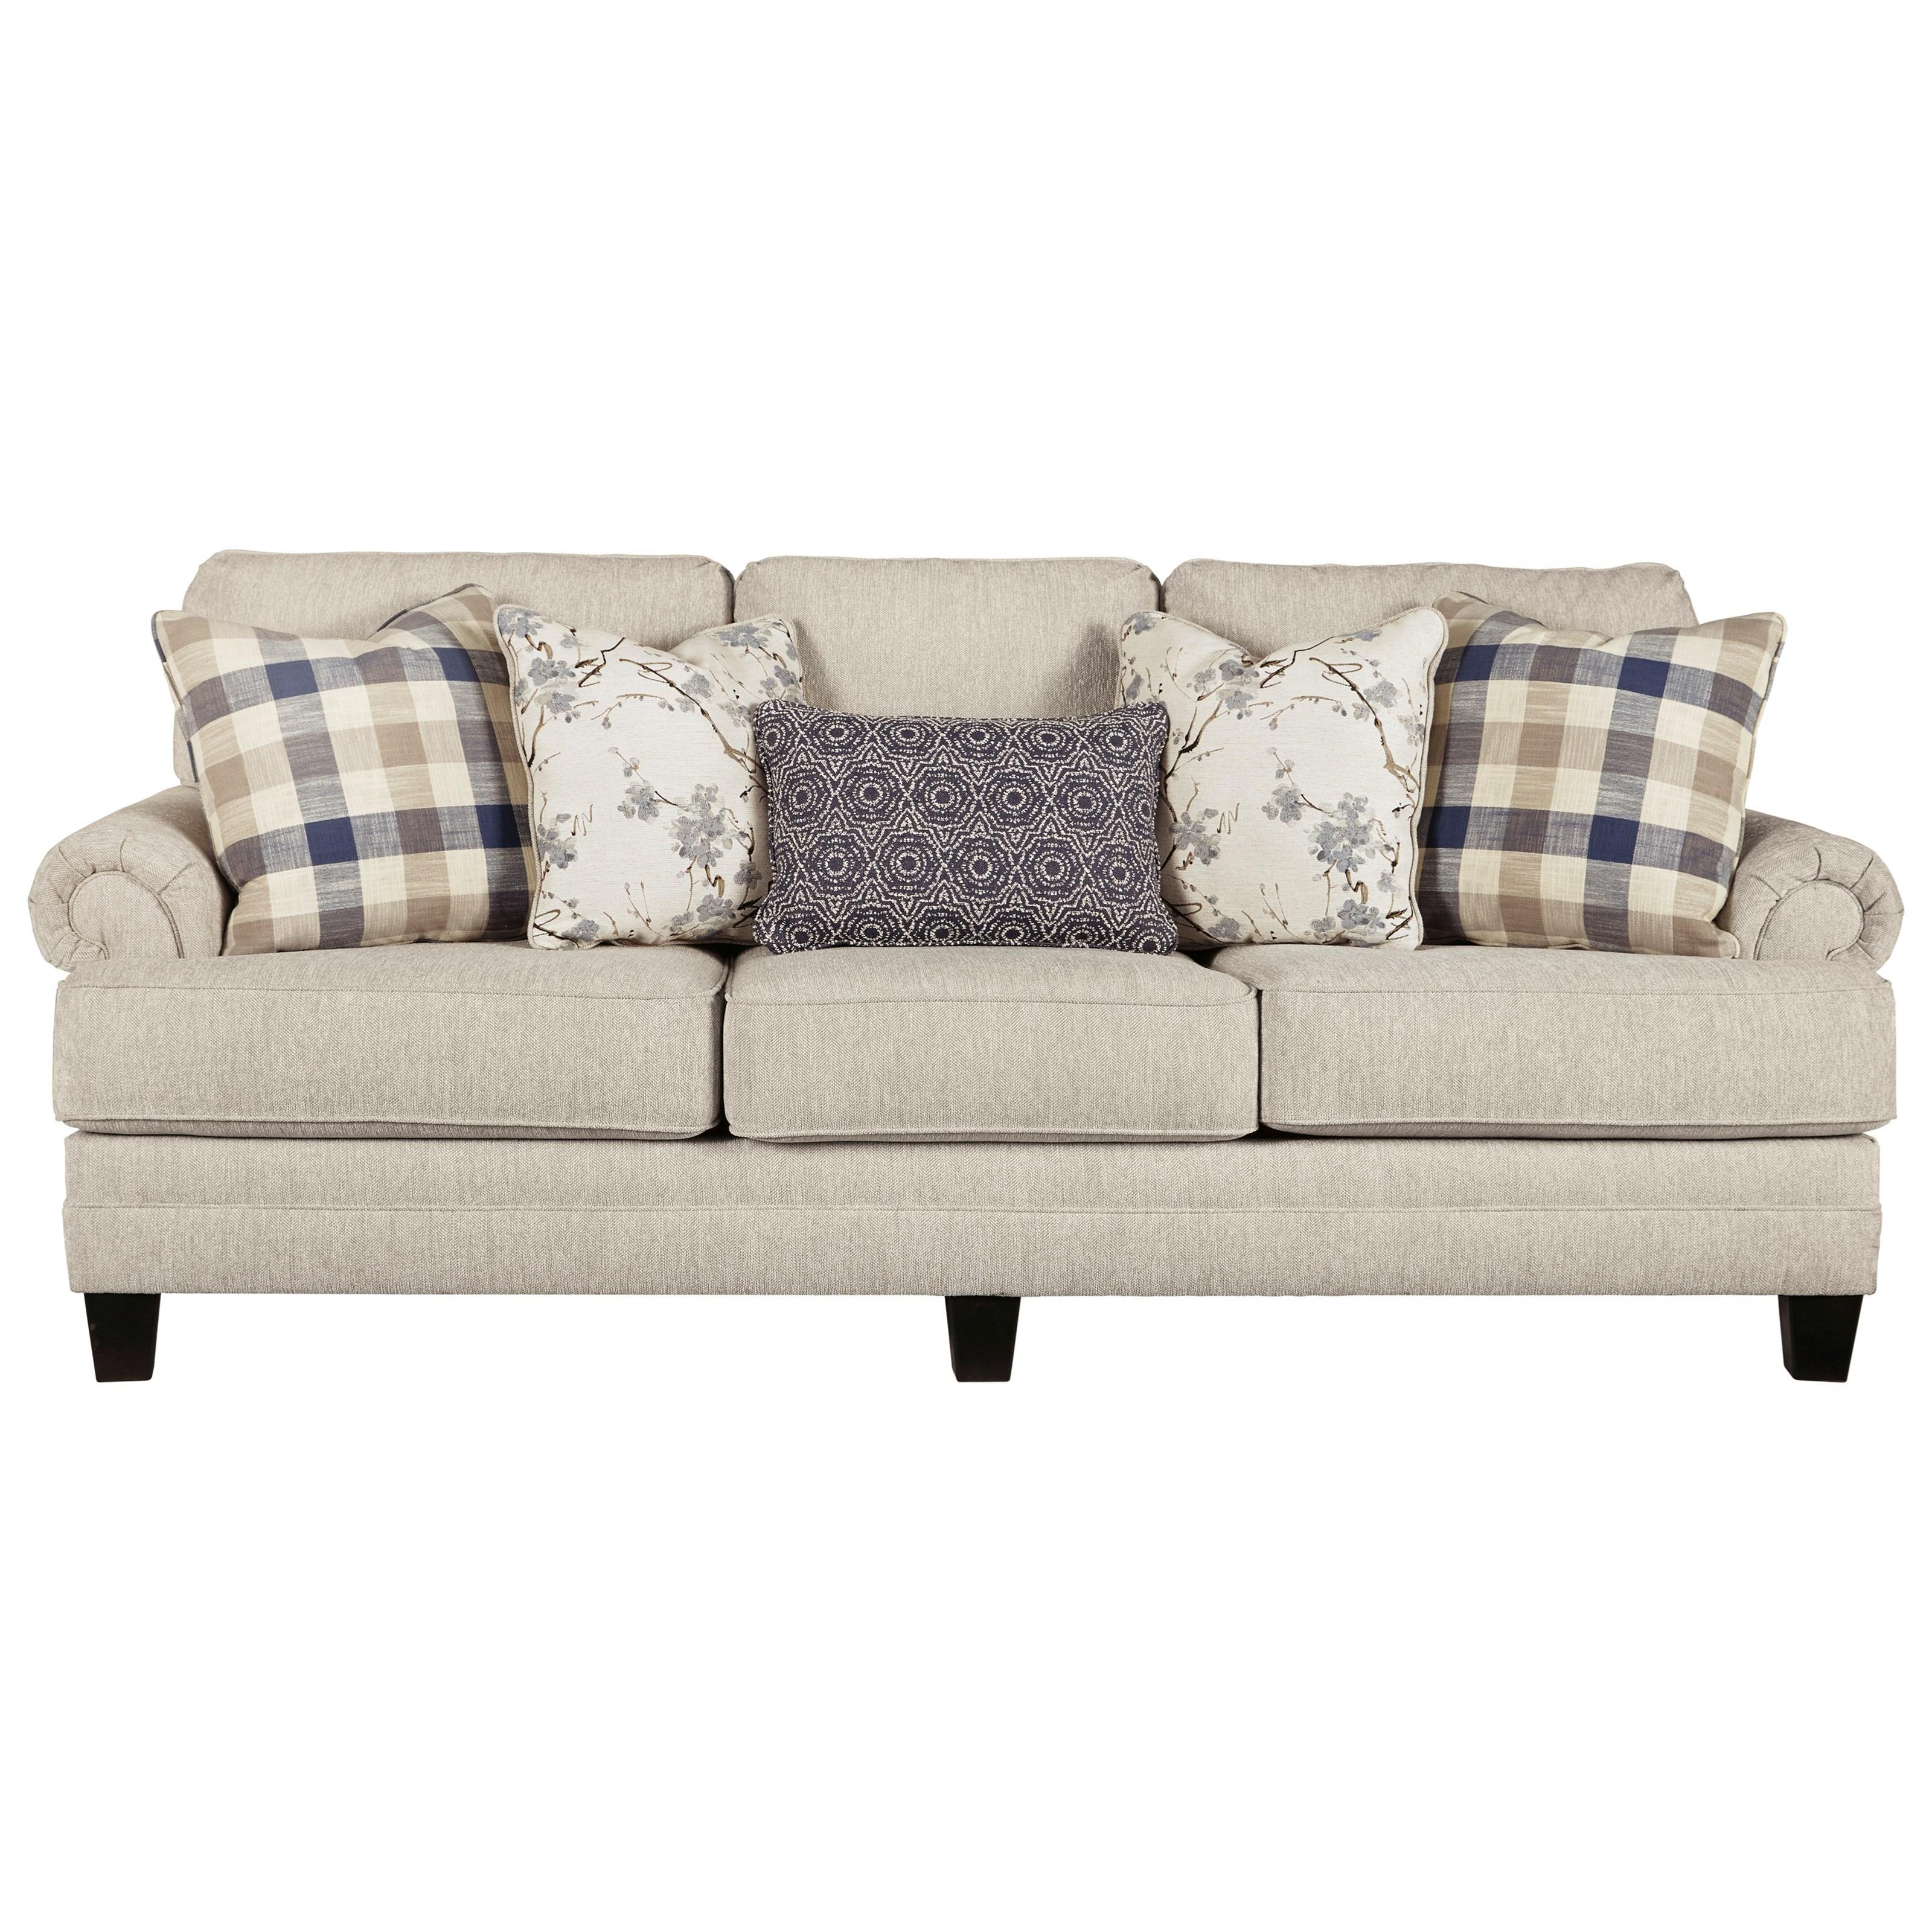 Meggett Queen Sofa Sleeper by Benchcraft at Zak's Warehouse Clearance Center